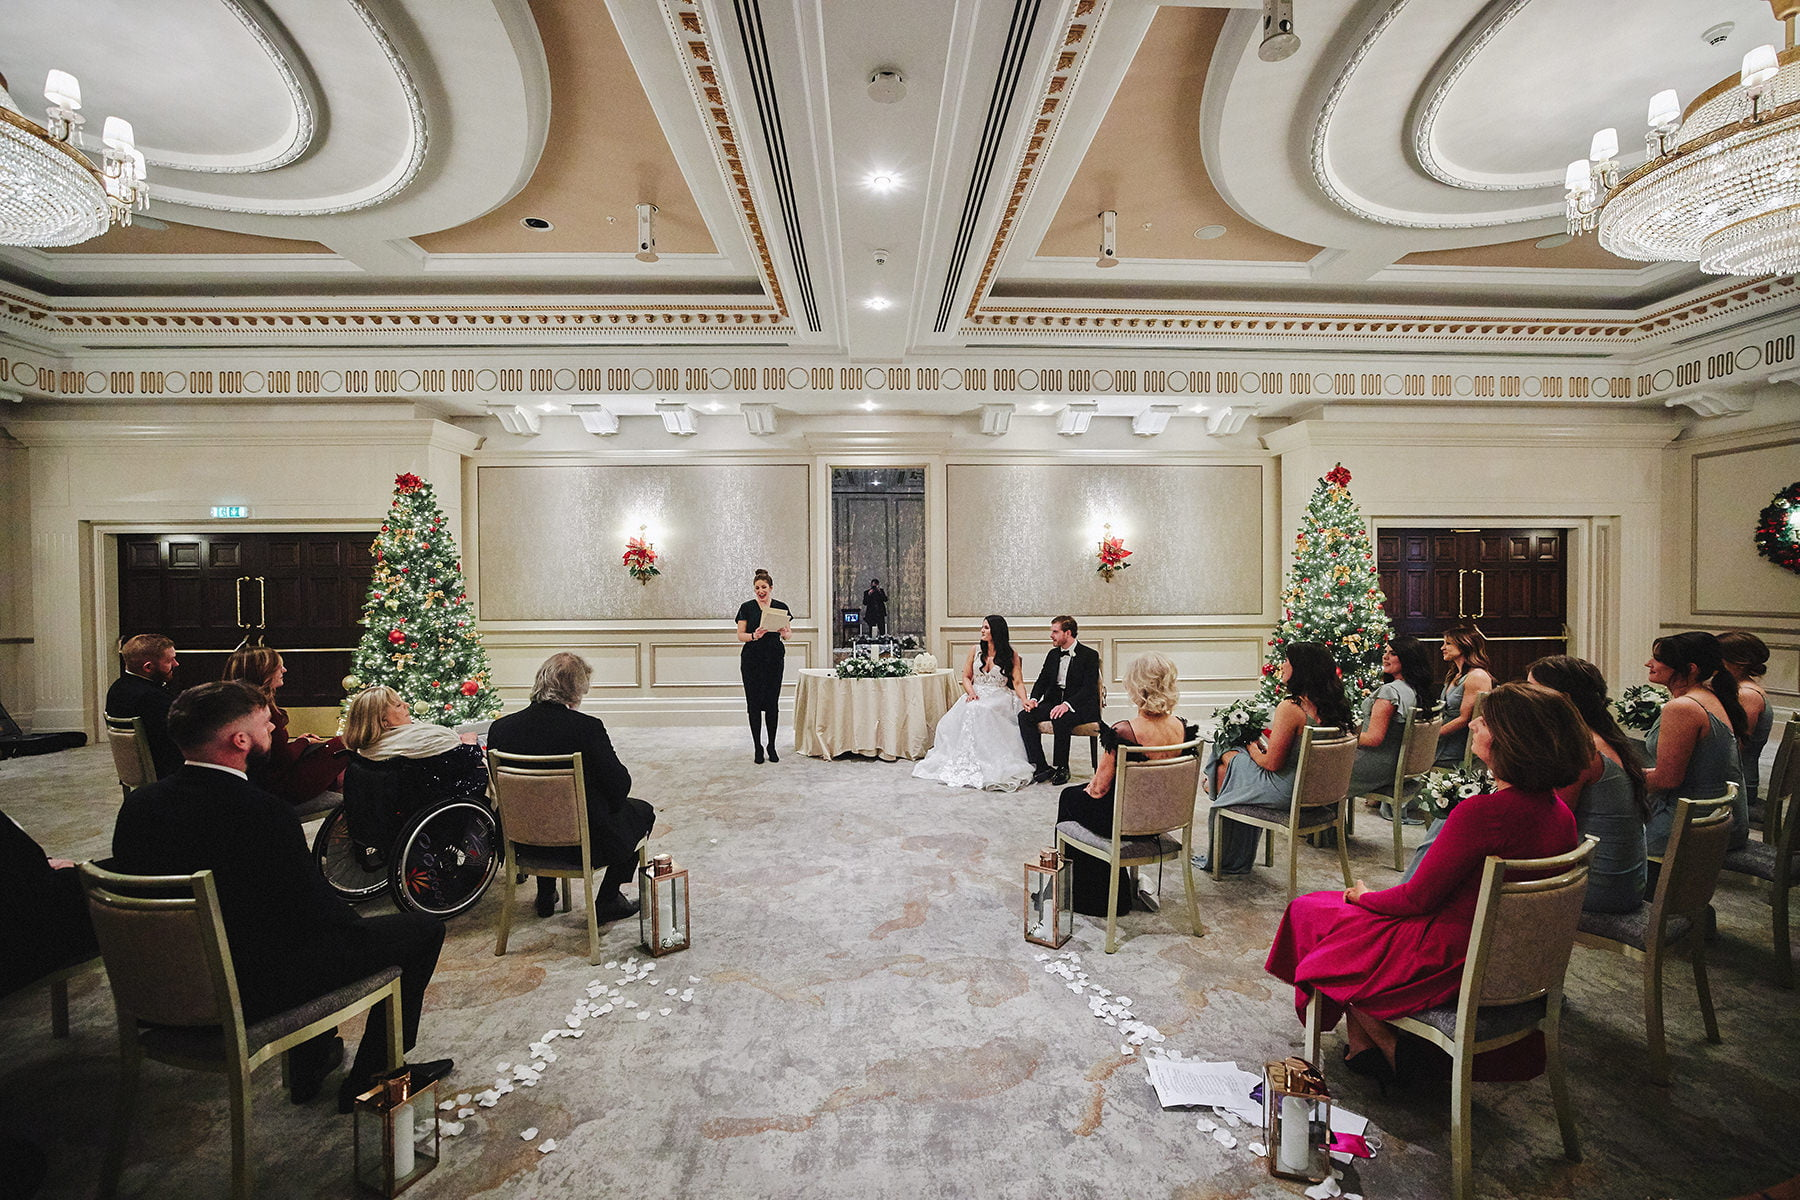 POWERSCOURT HOTEL RESORT INTIMATE WEDDING 44